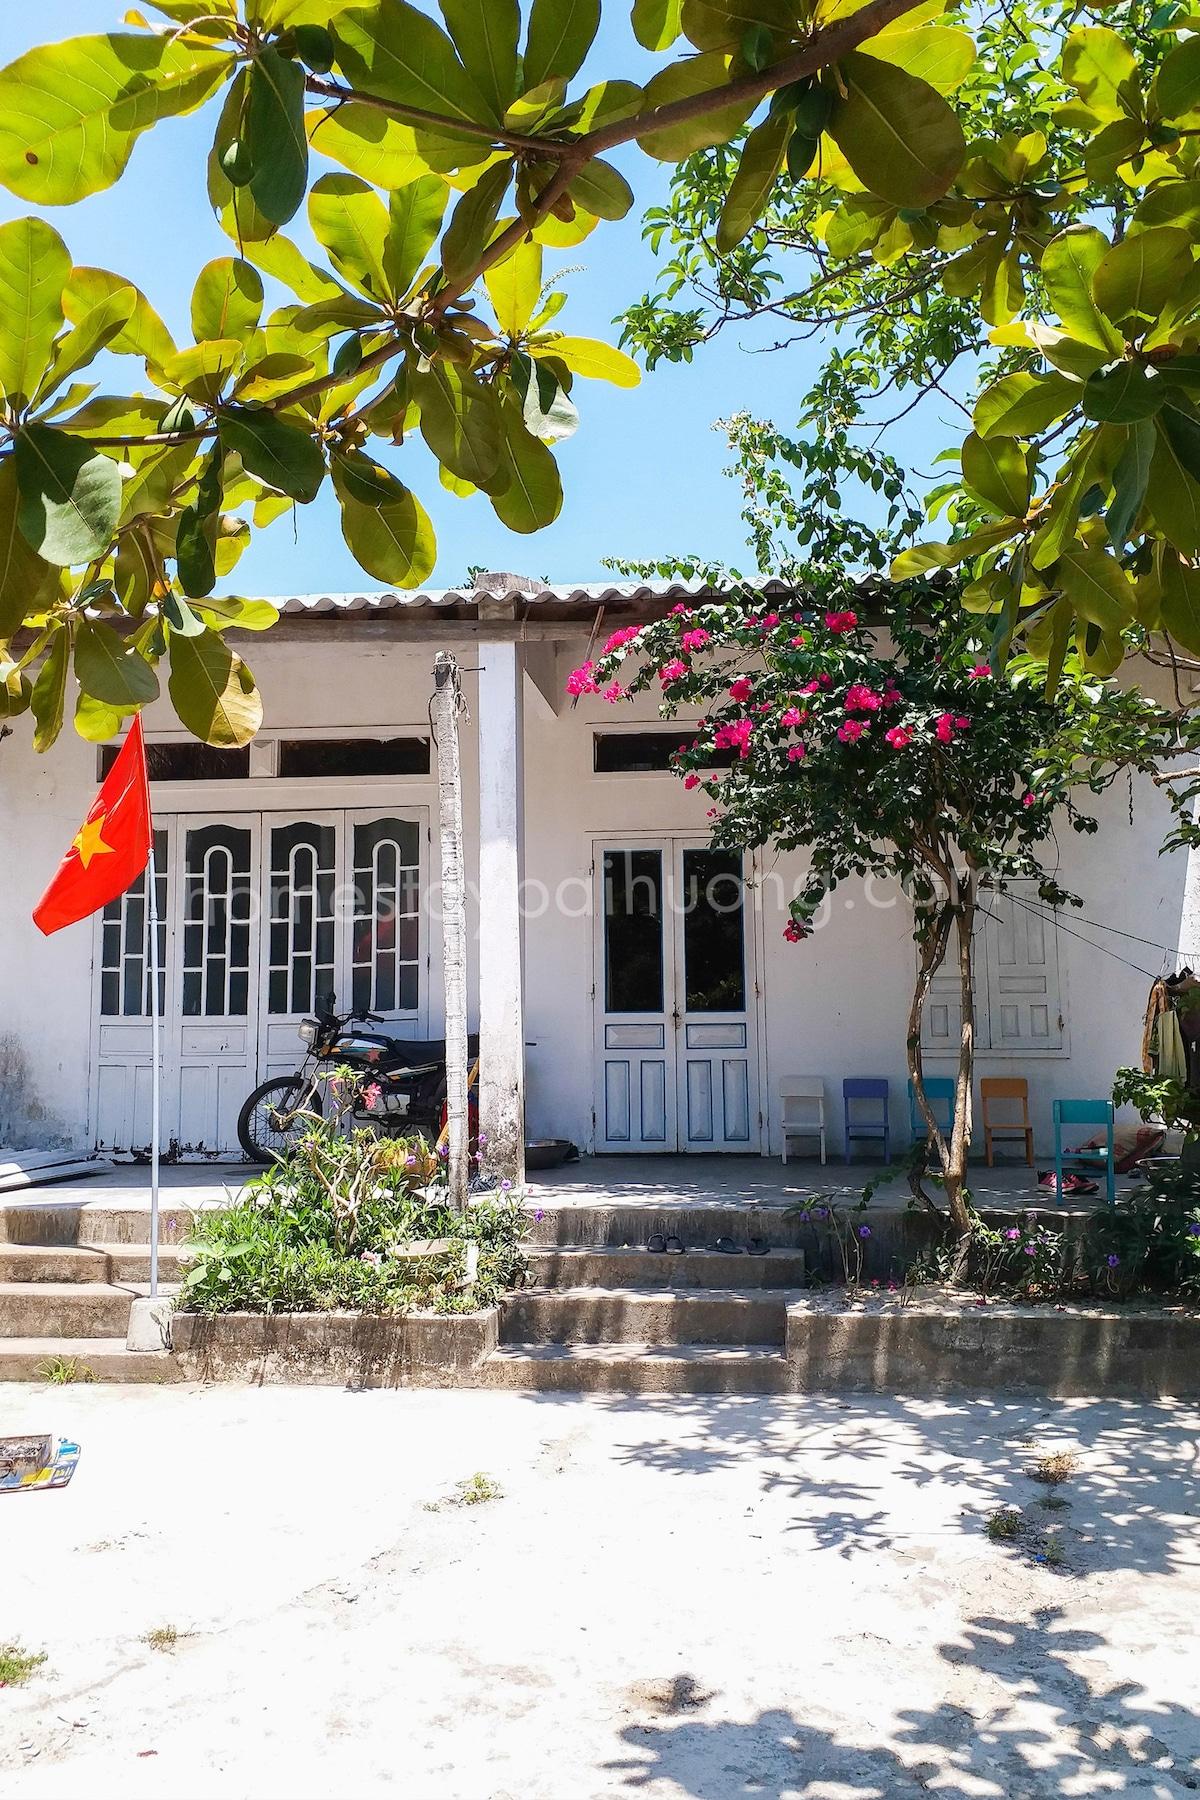 Vacation home- Cham island